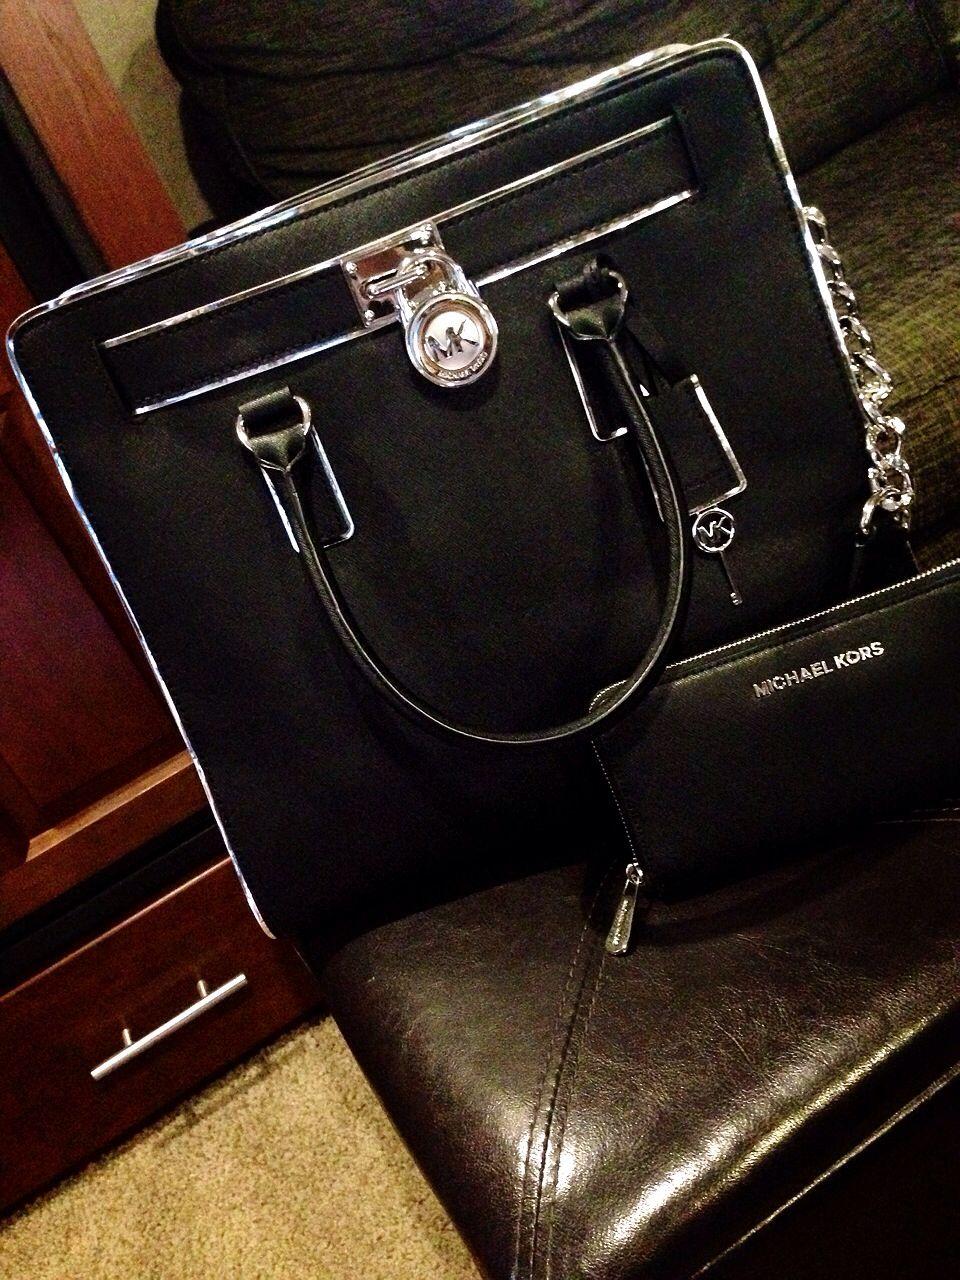 Love my black and silver Michael Kors tote! #MK